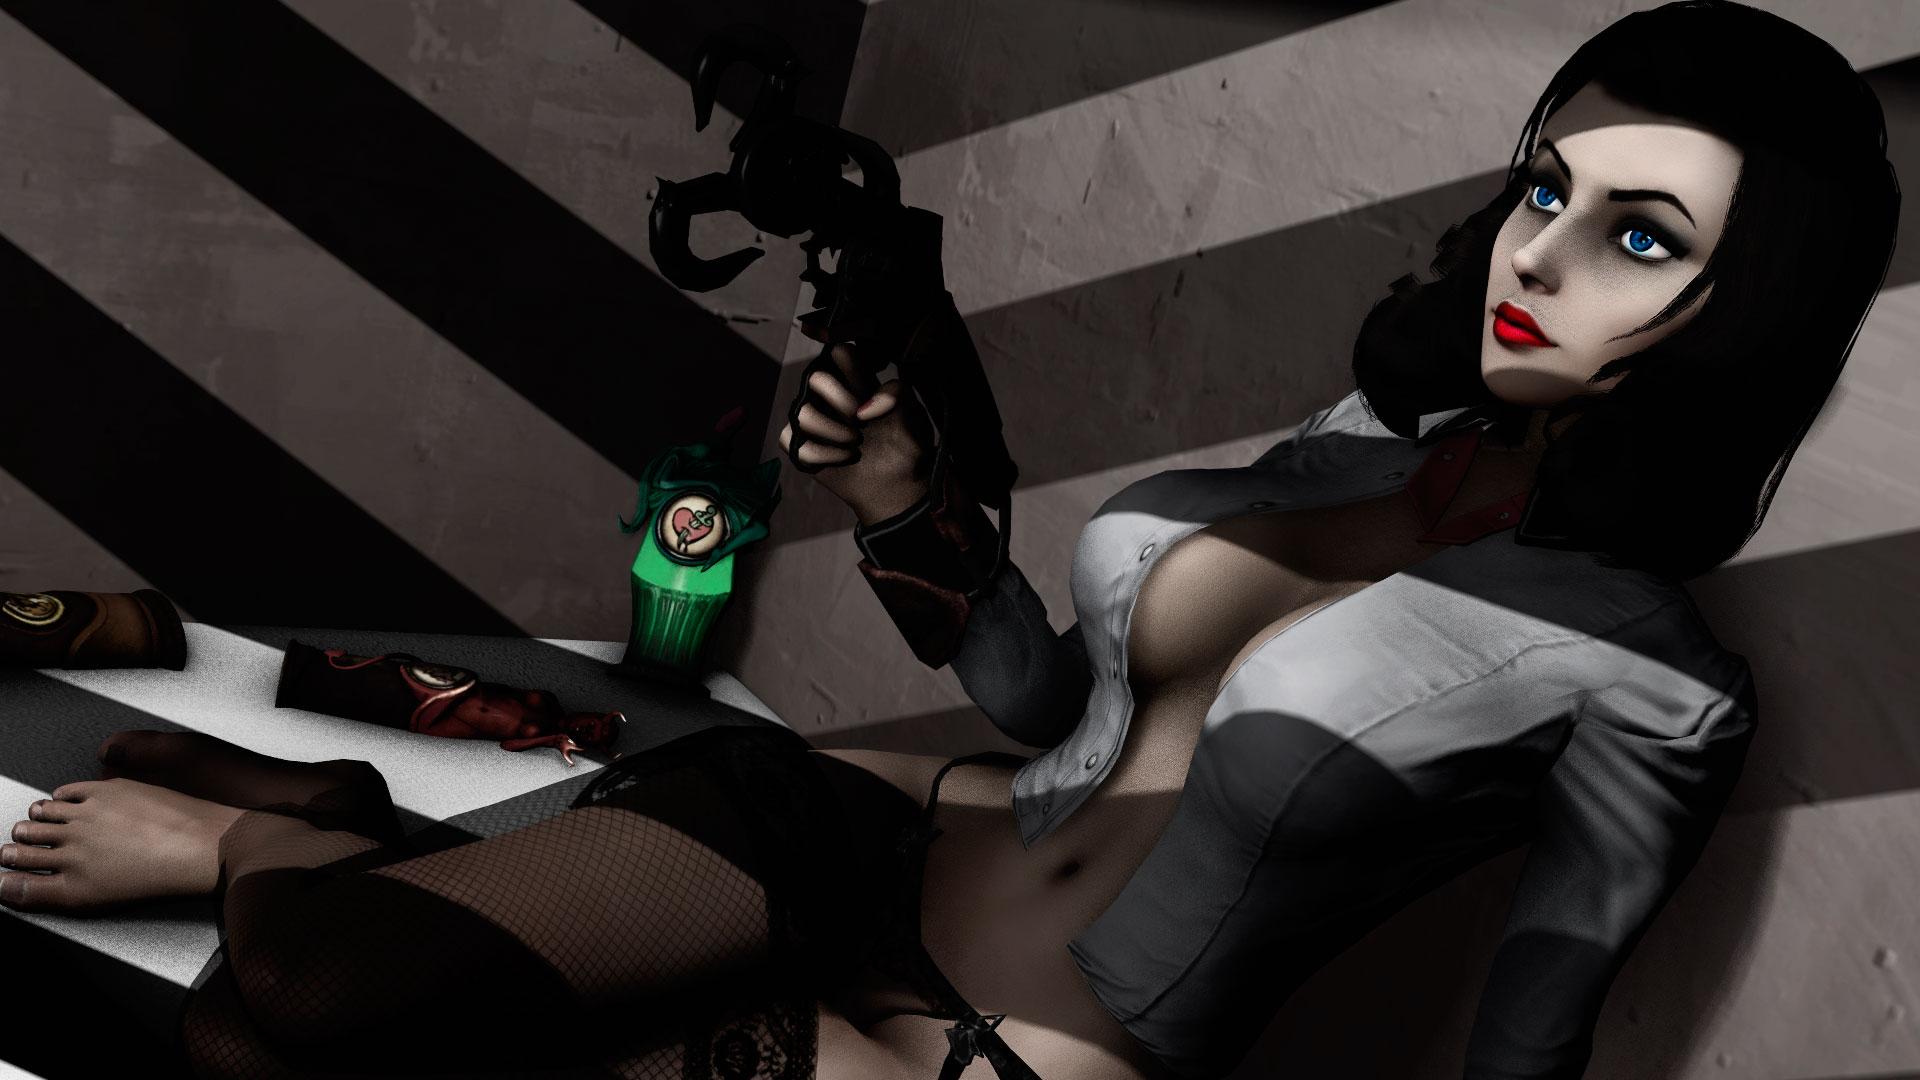 Bioshock Infinite Porn - Noir Style Elizabeth from Bioshock Infinite. by Nerd Porn ...